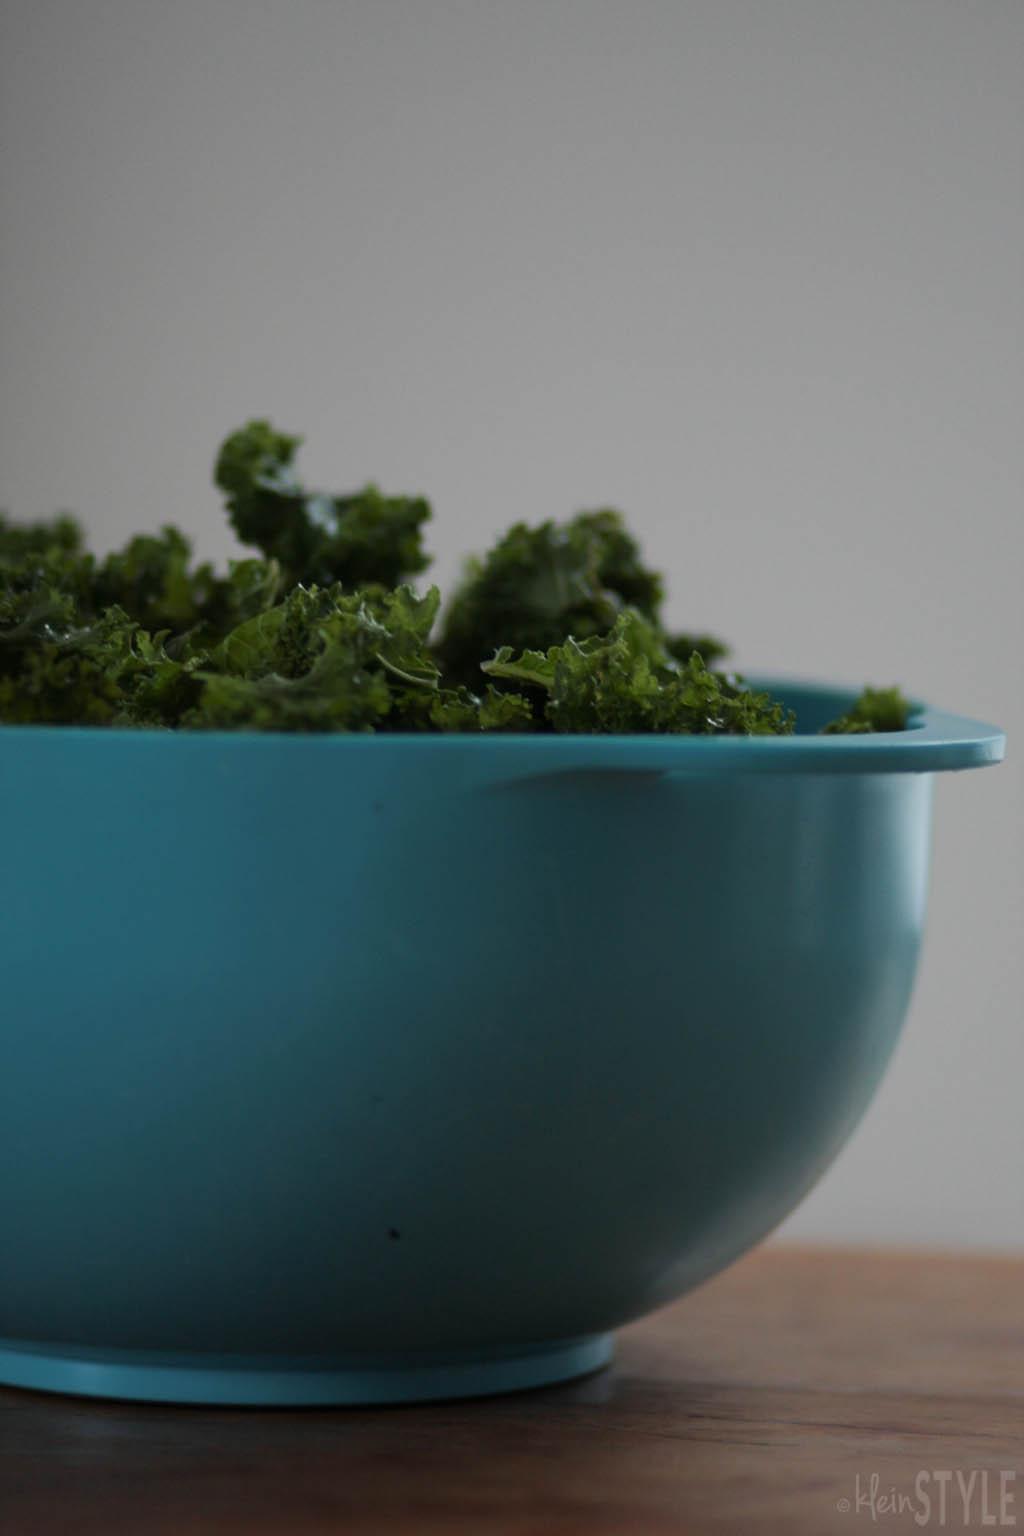 food-love-2in1-kale-heaven-by-kleinstyle-com-8-2